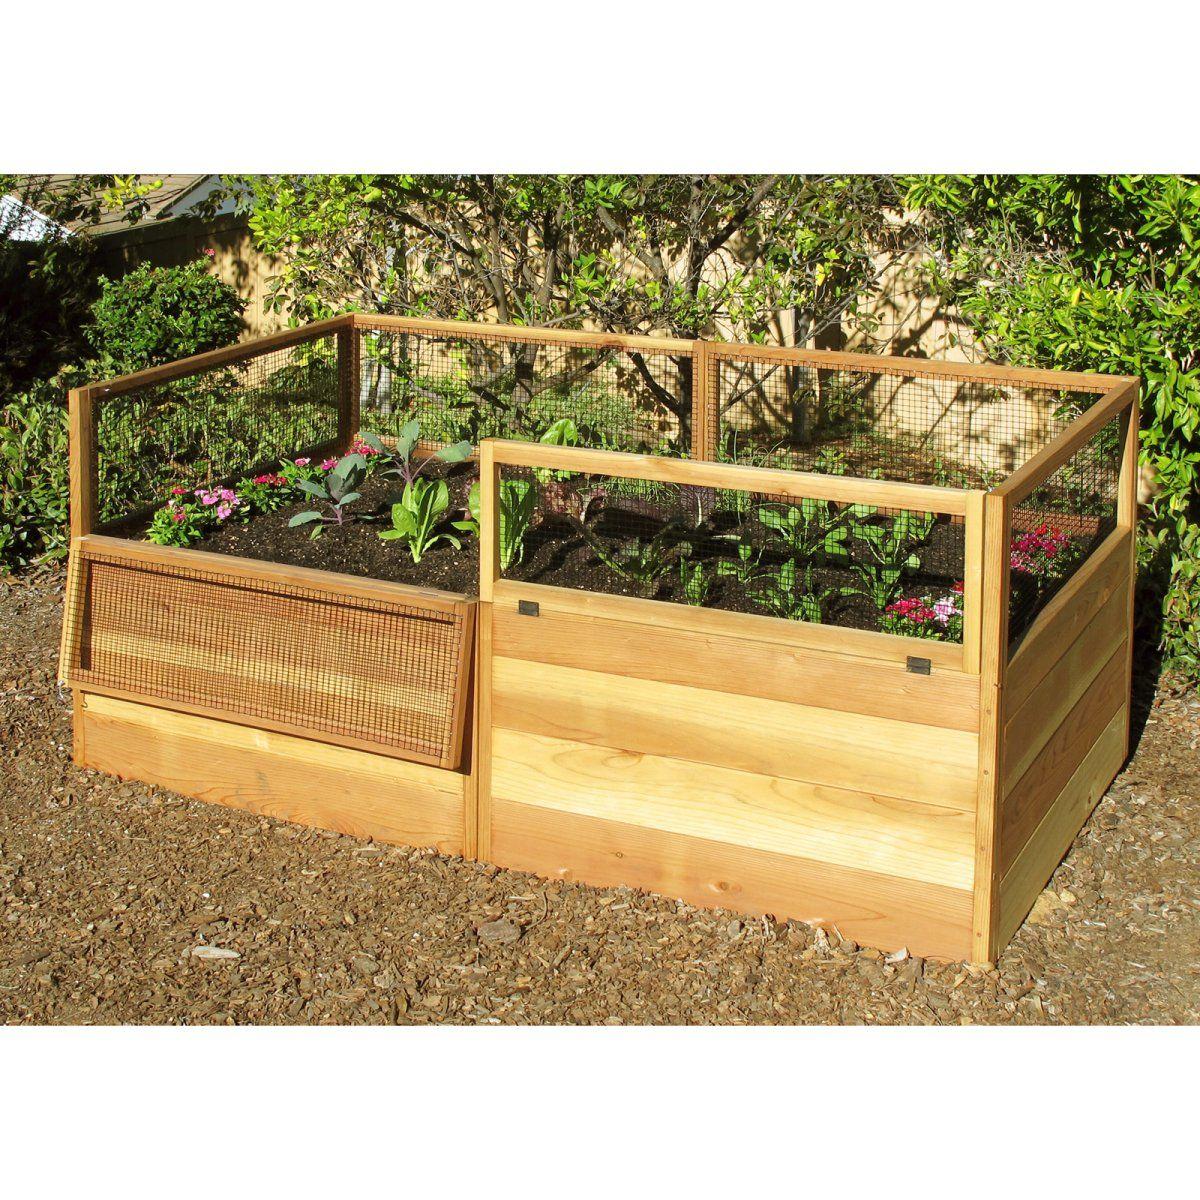 Raised vegetable garden cubby like raised gardenplanters